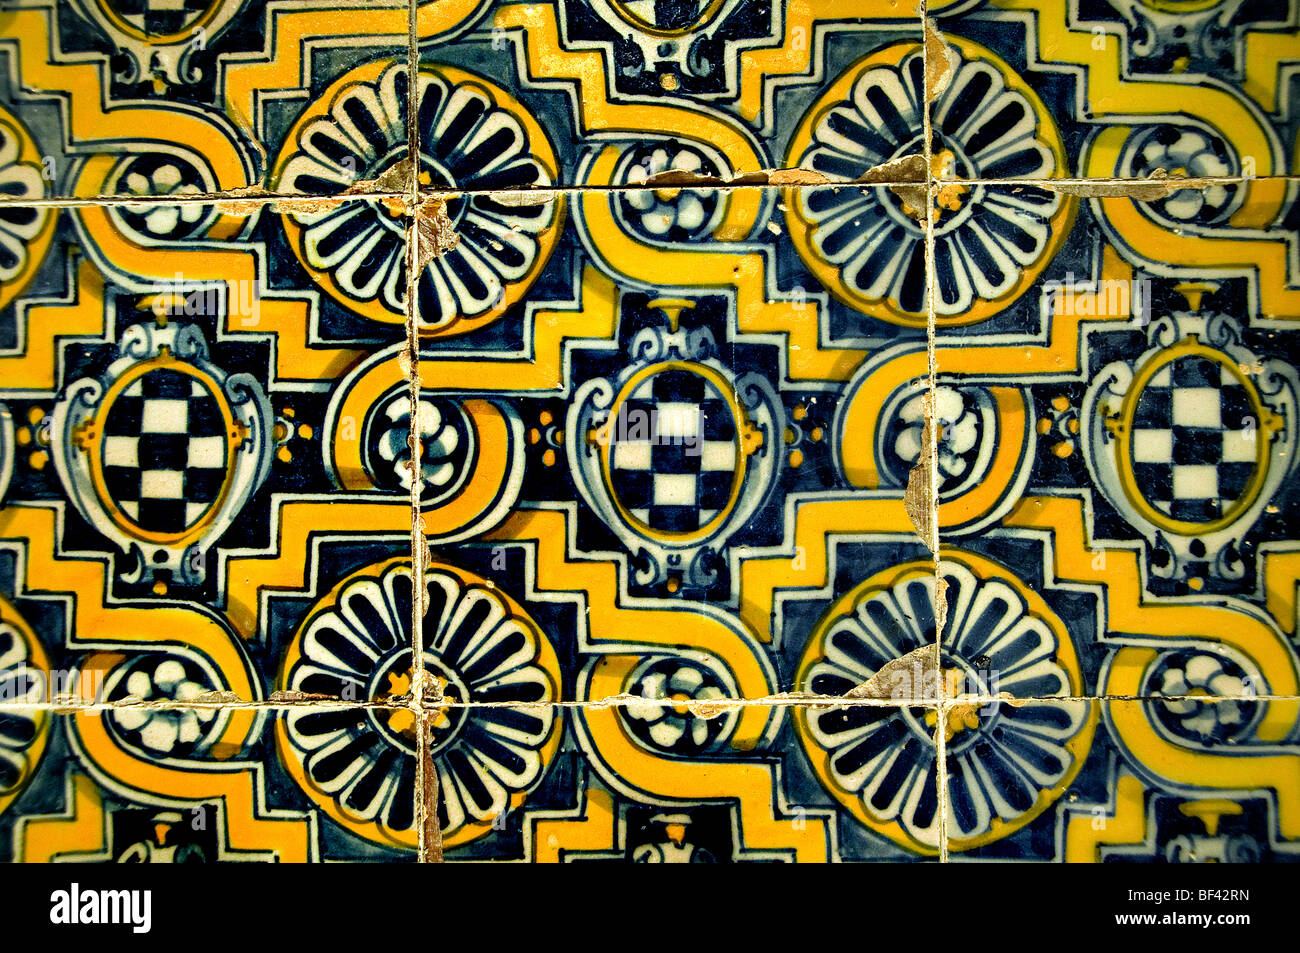 Talavera Spain Spanish tile tiles 1595 1610 Stock Photo 26520249